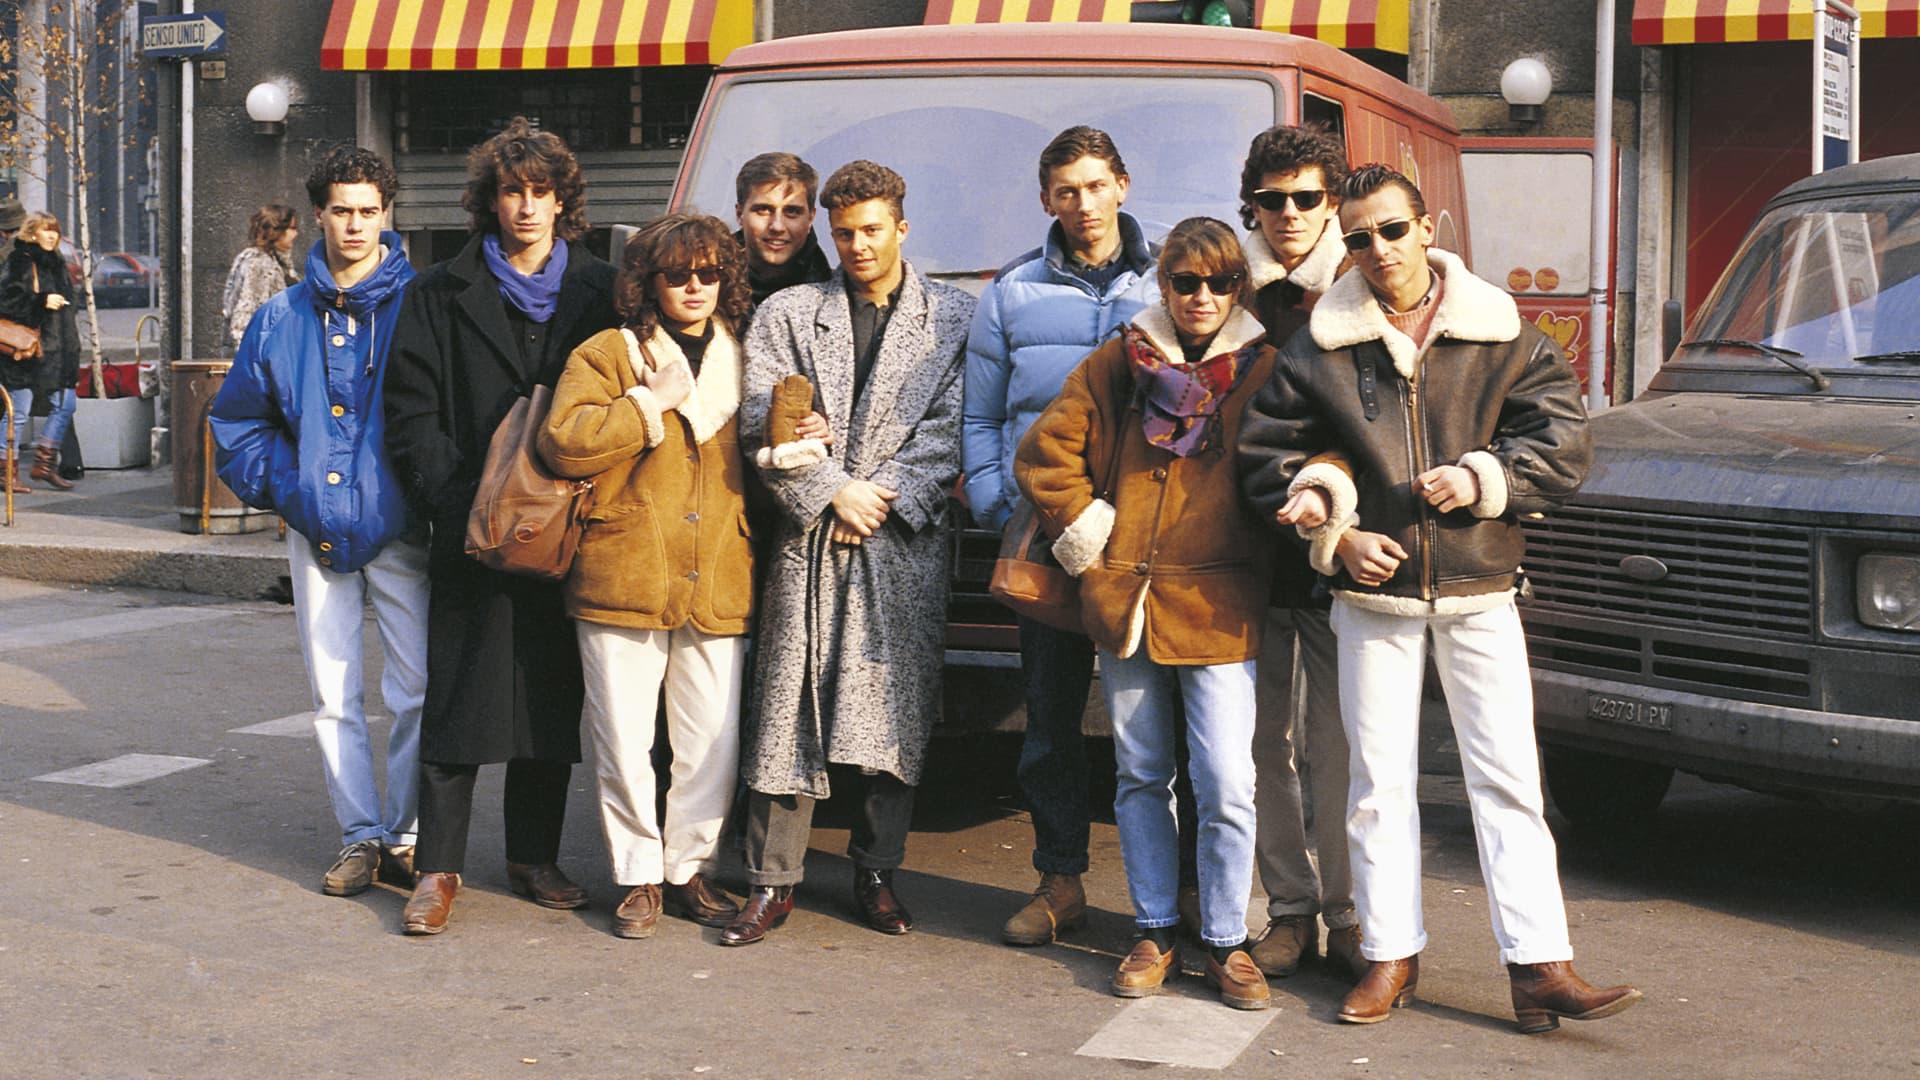 Teens in Milan wearing Timberland boots